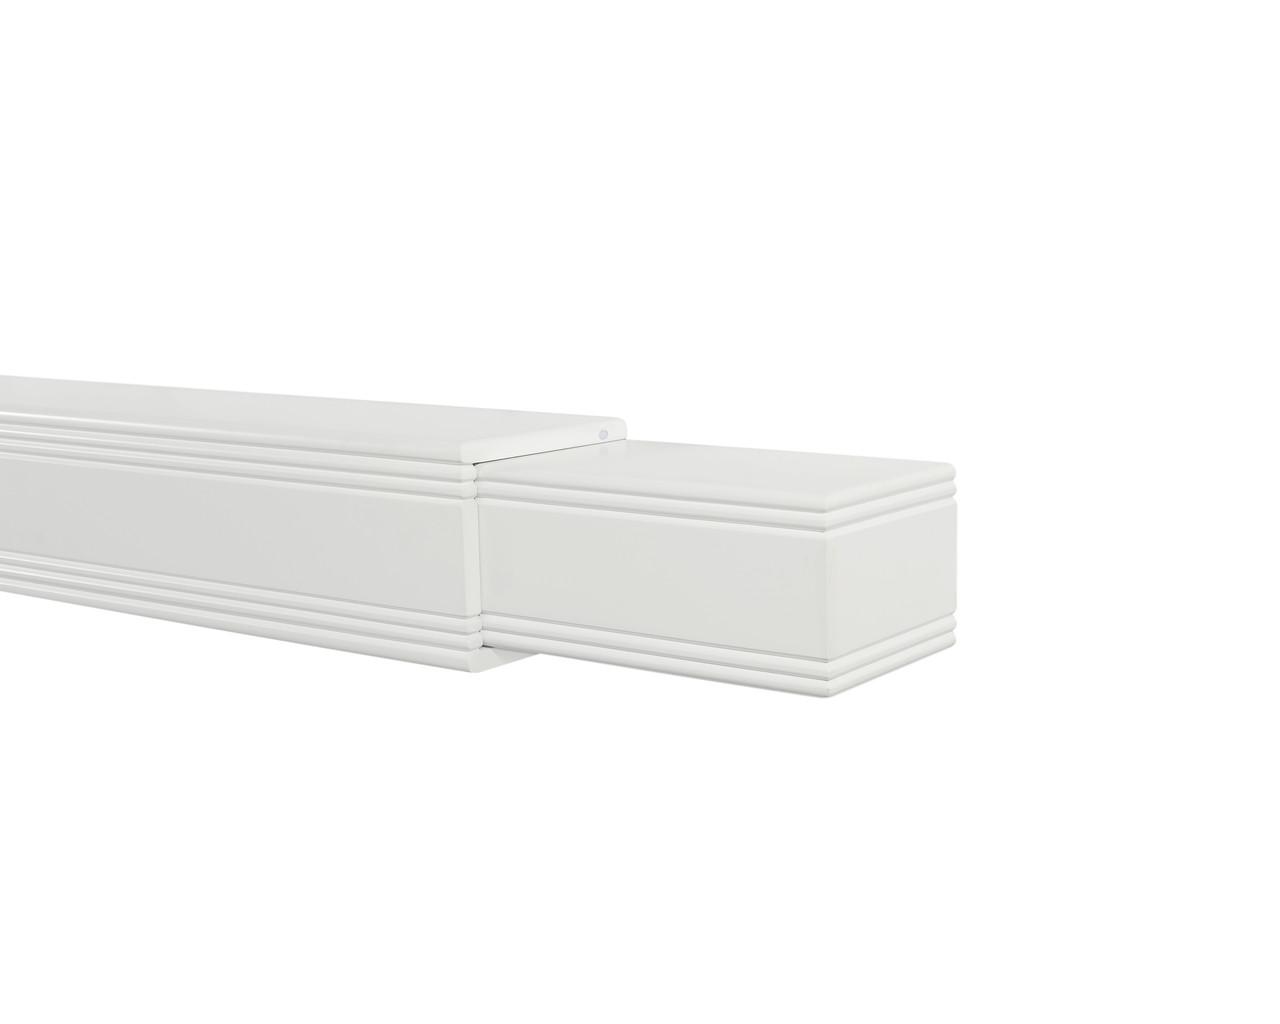 The Emory Adjustable MDF Mantel Shelf